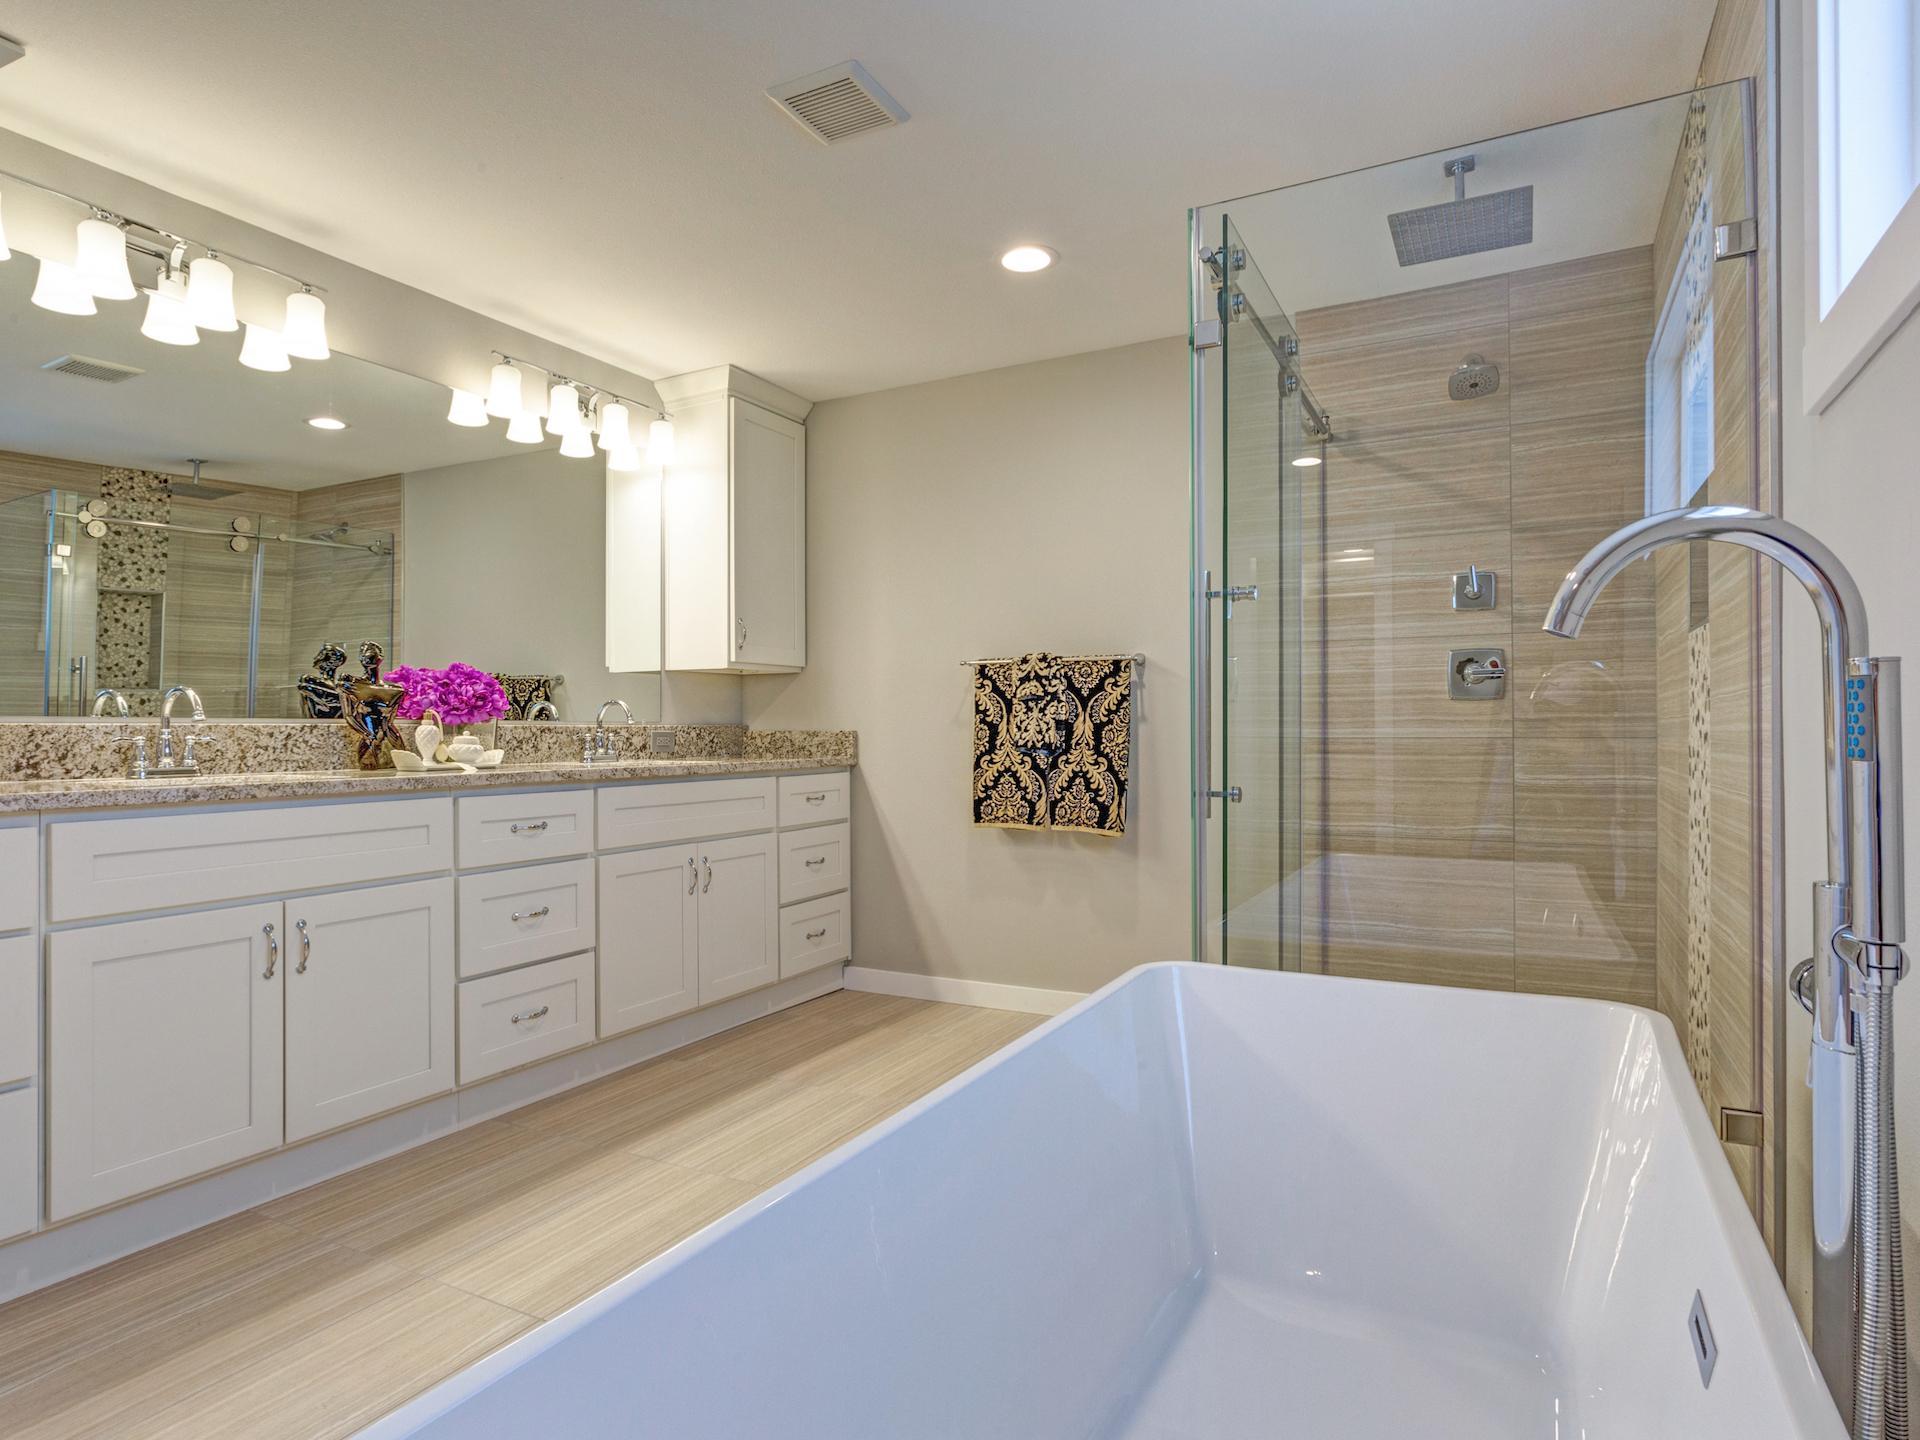 Bathroom Vanity Standing Tub Cabinet Mirror Frameless Shower